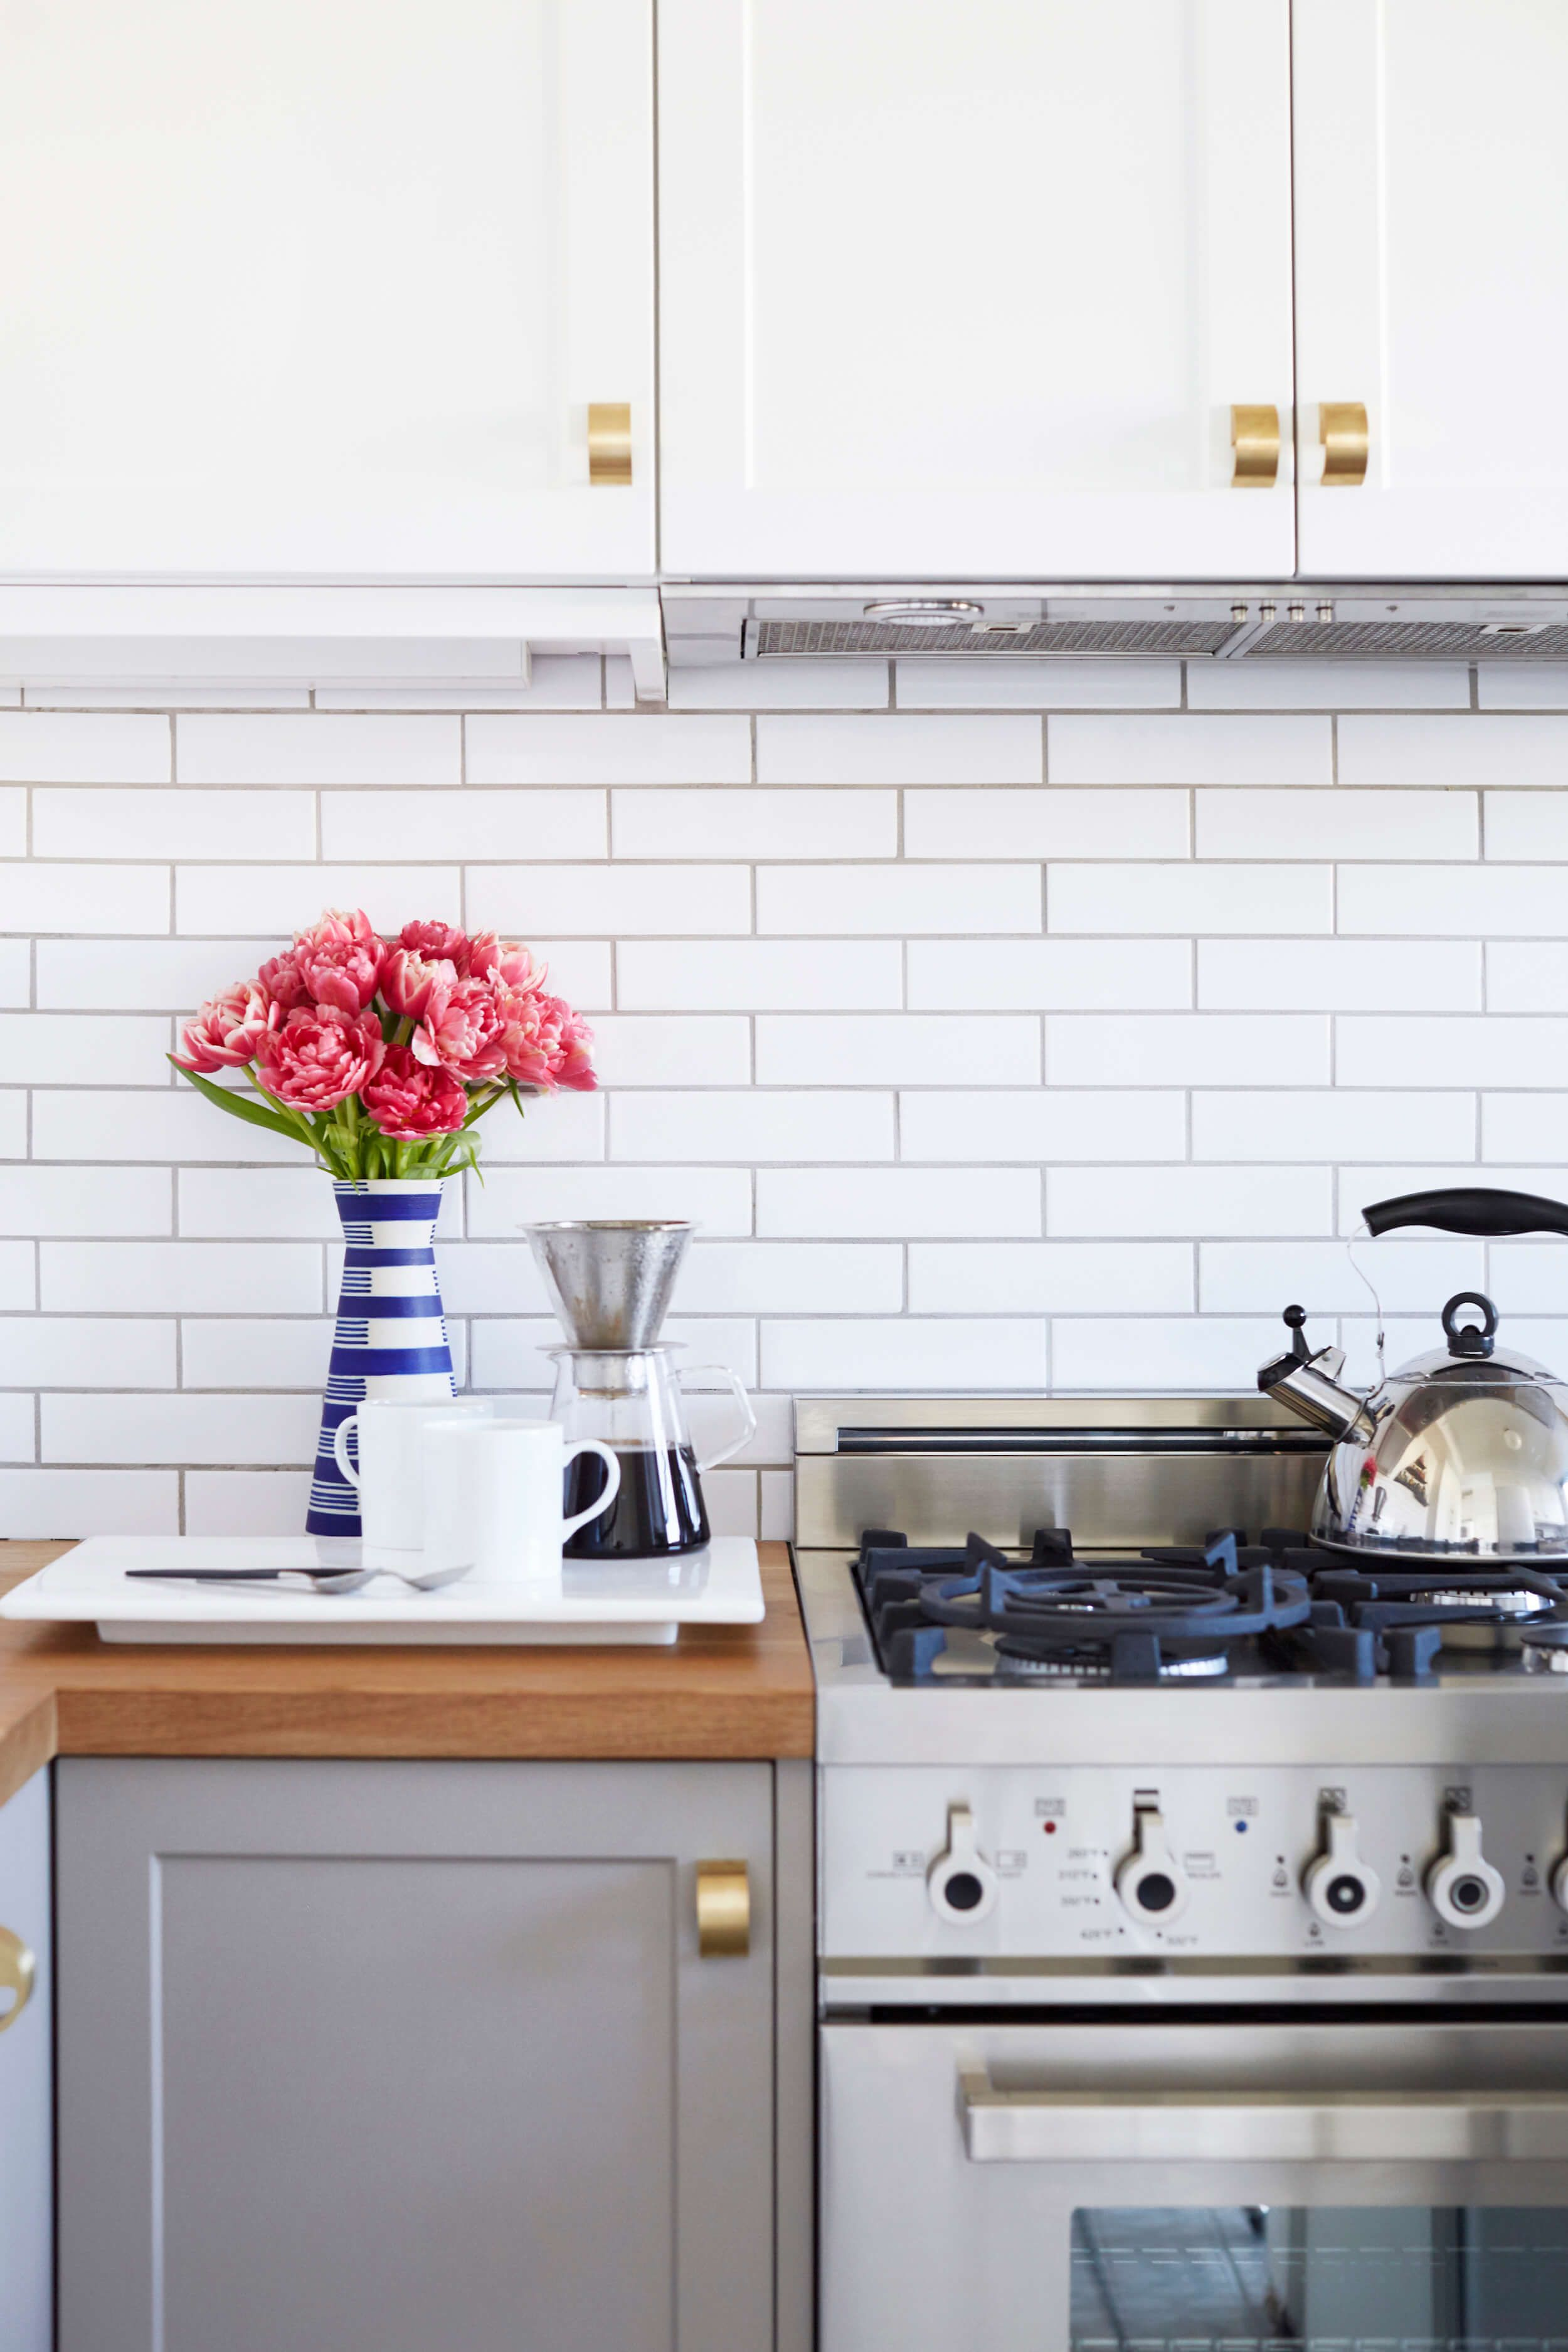 Orlando S Kitchen Reveal Emily Henderson Kitchen Renovation Kitchen Remodel Kitchen